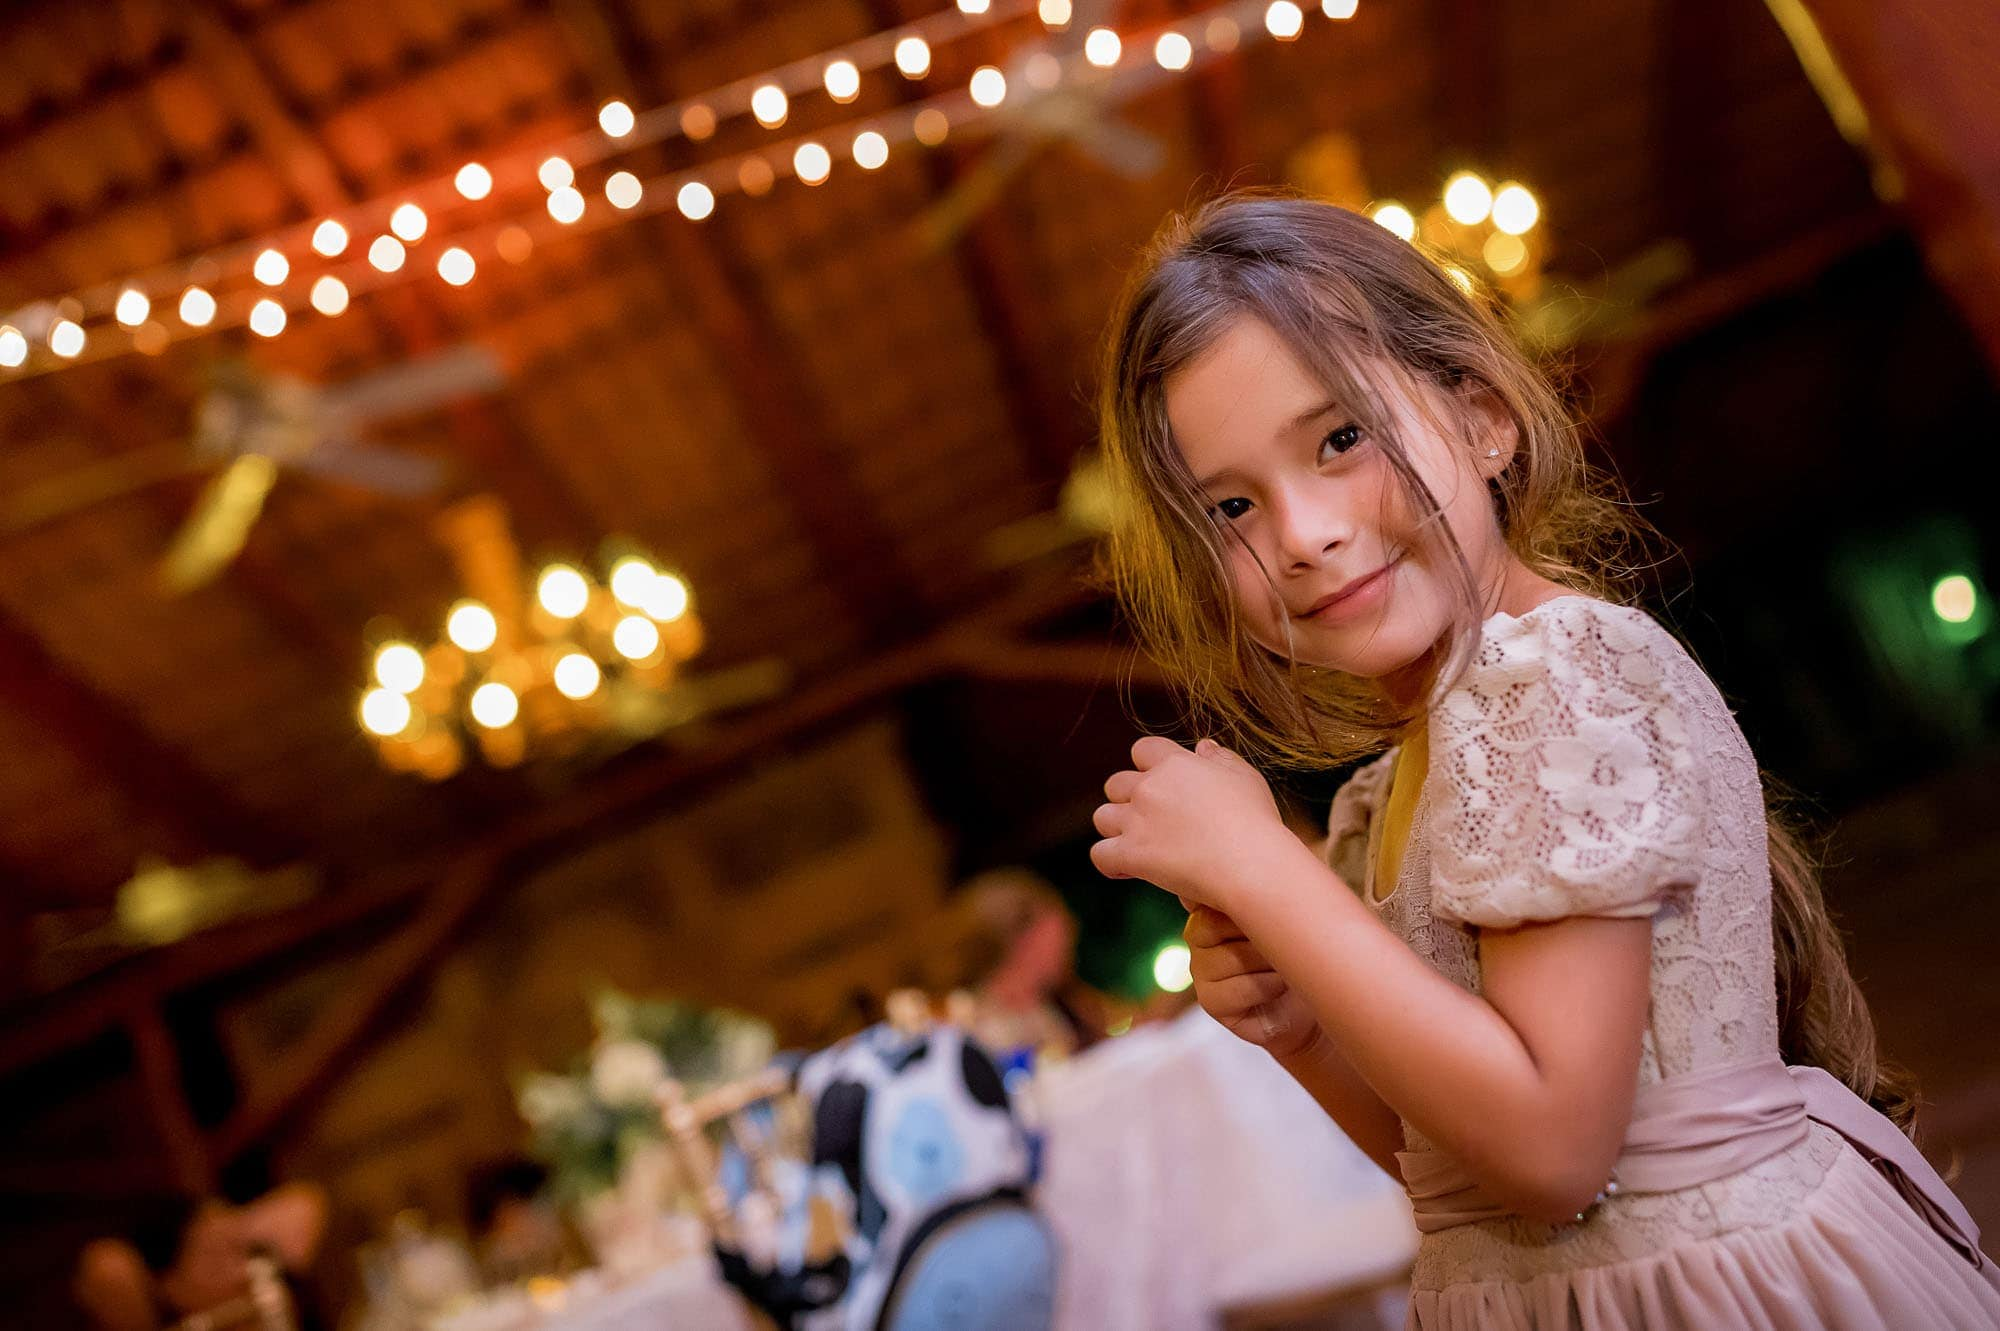 Cute kid at a formal wedding